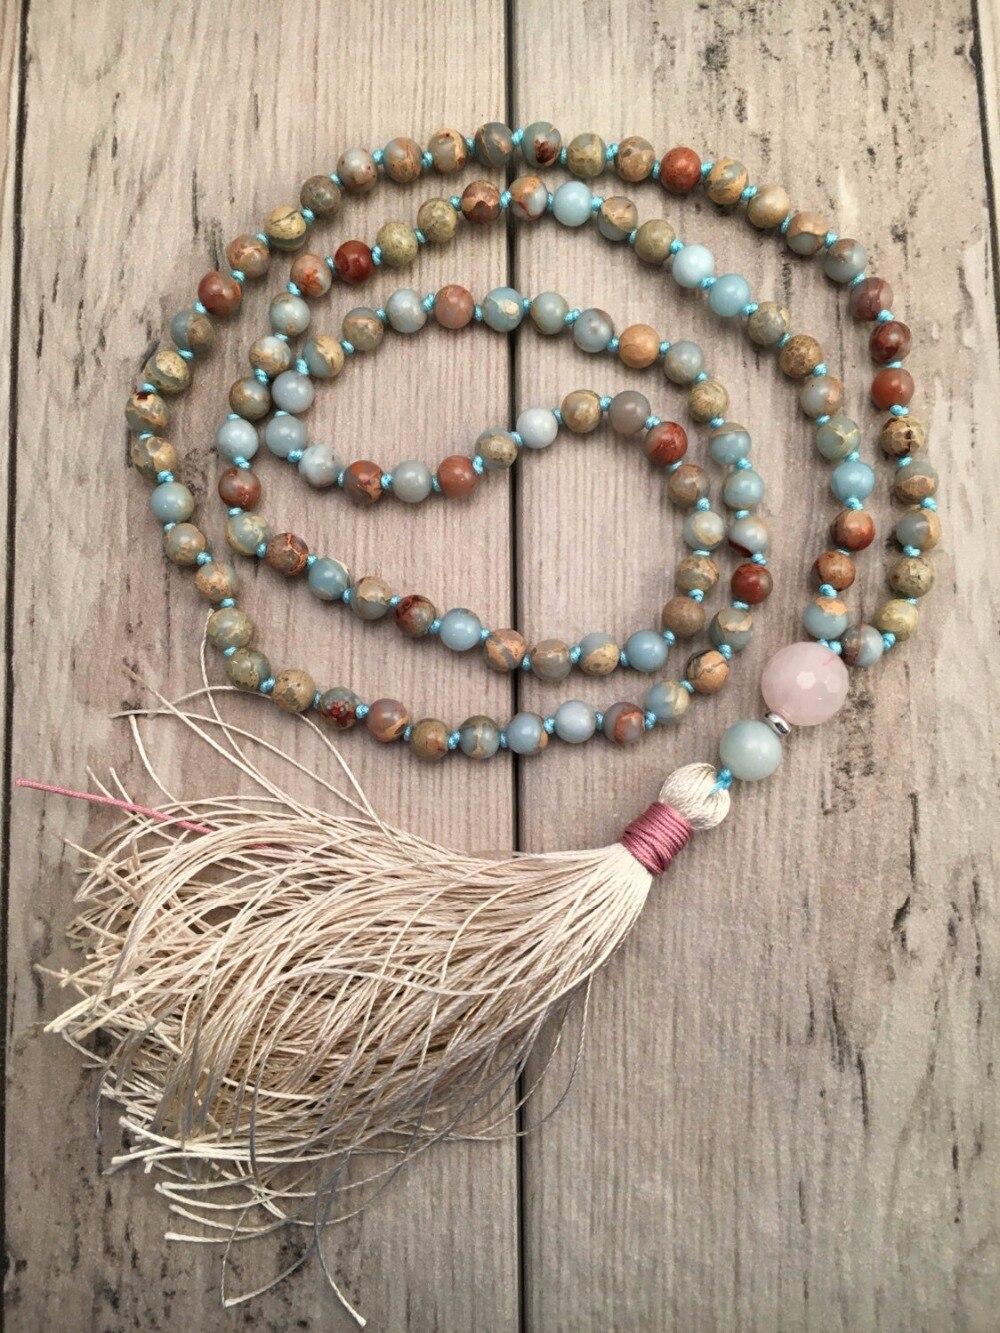 Aqua Terra Jaspers Hand Knotted Necklace 108 Mala Bead Necklace Tassel Necklaces Yoga Mala Meditation Jewelry Prayer Necklaces